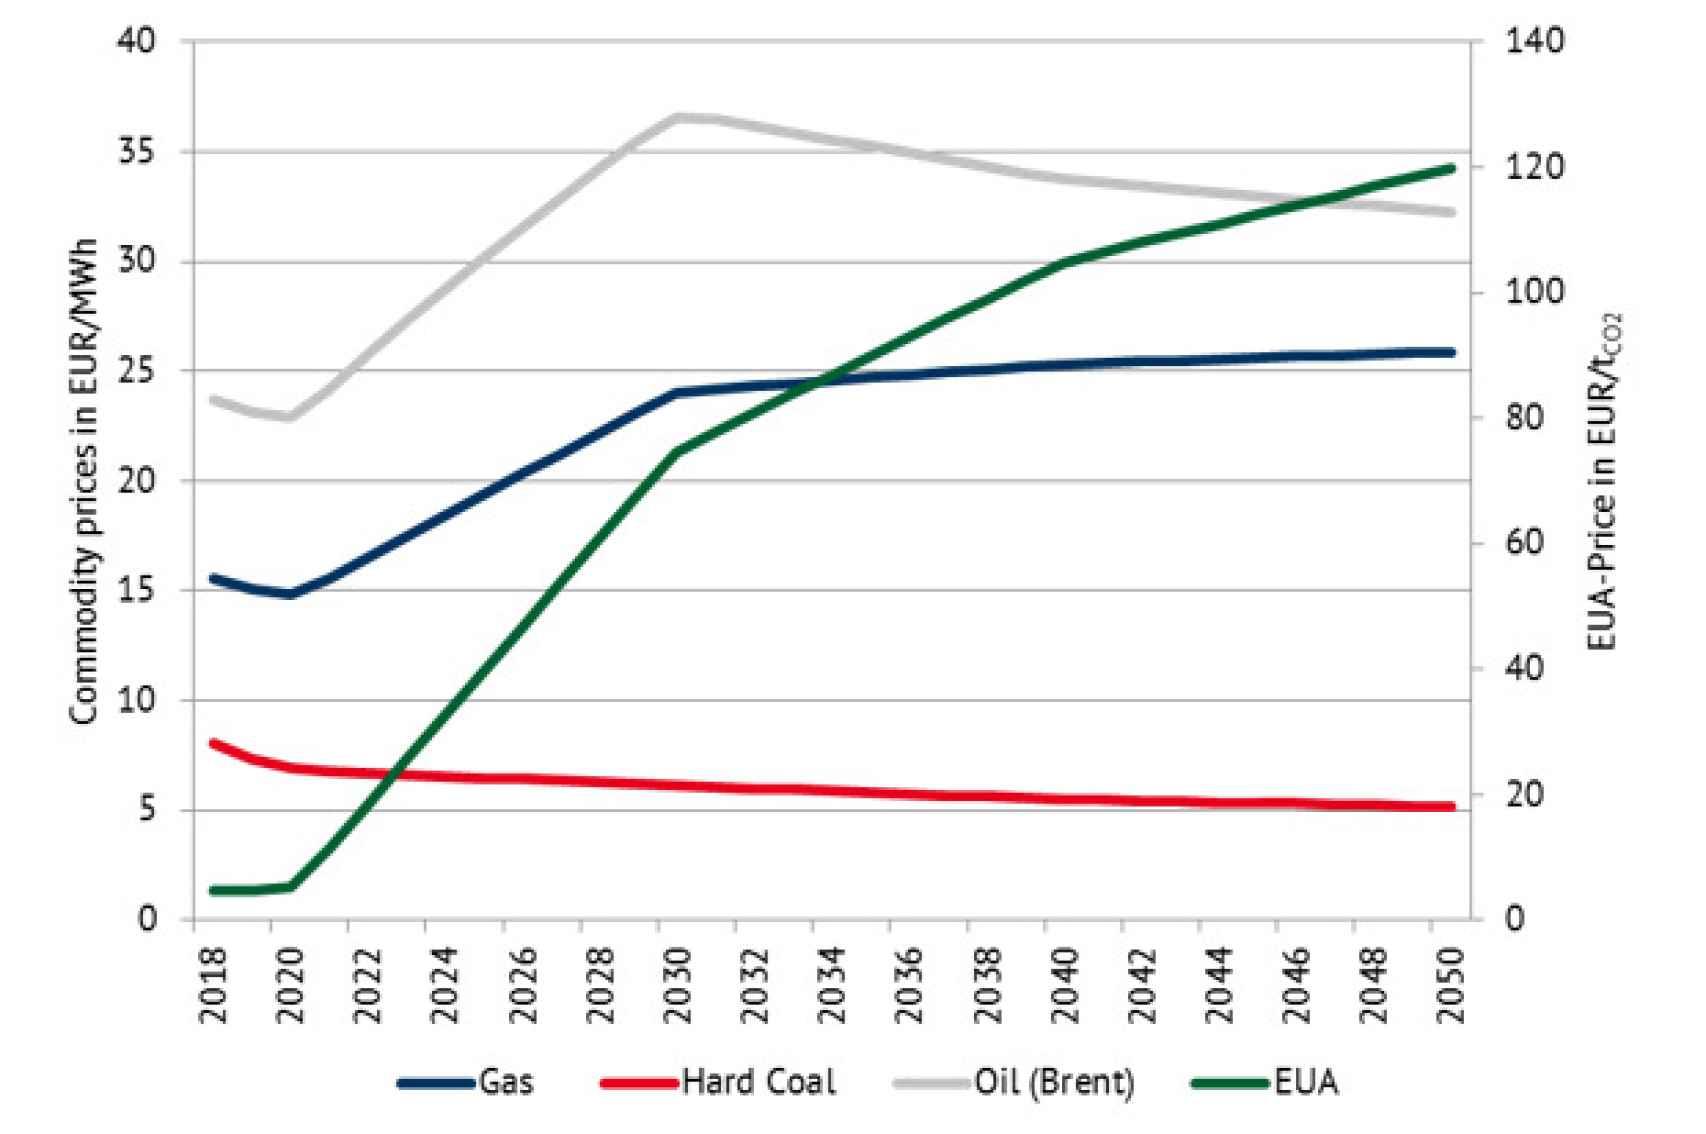 Fuente: https://blog.energybrainpool.com/en/trends-in-the-development-of-electricity-prices-eu-energy-outlook-2050/